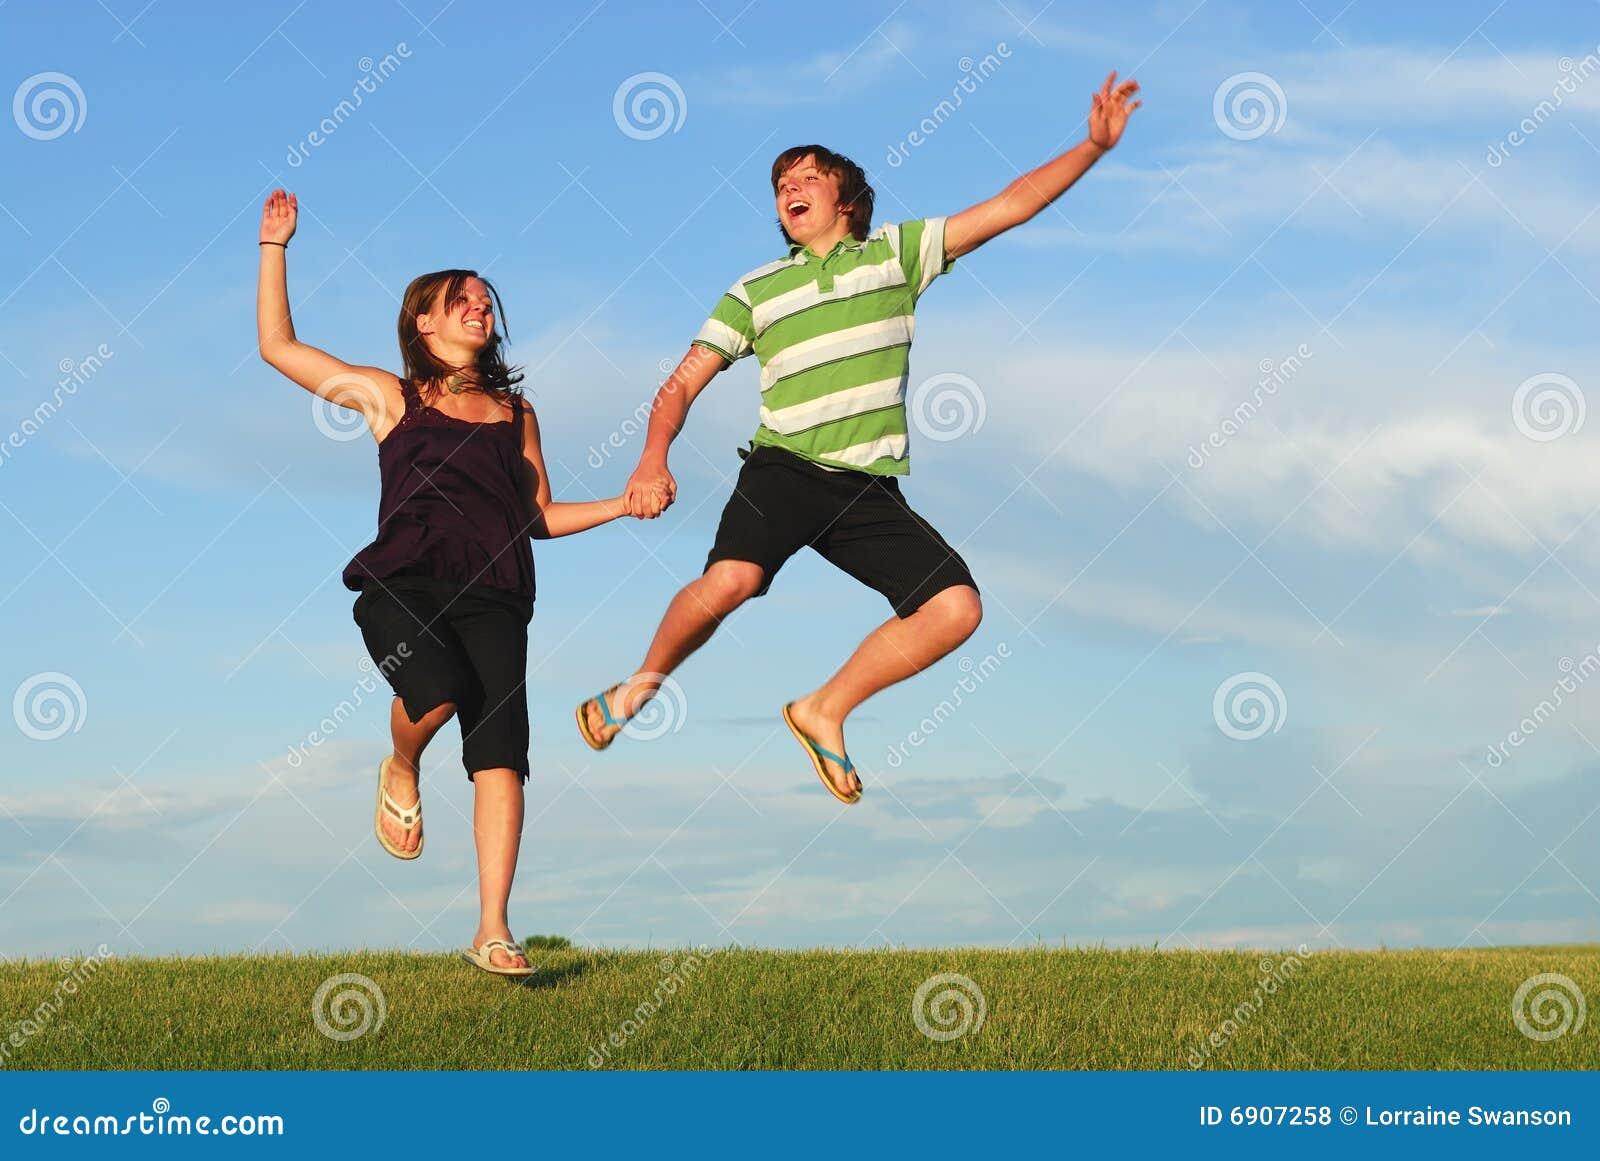 jumping for joy royalty free stock photos image 6907258